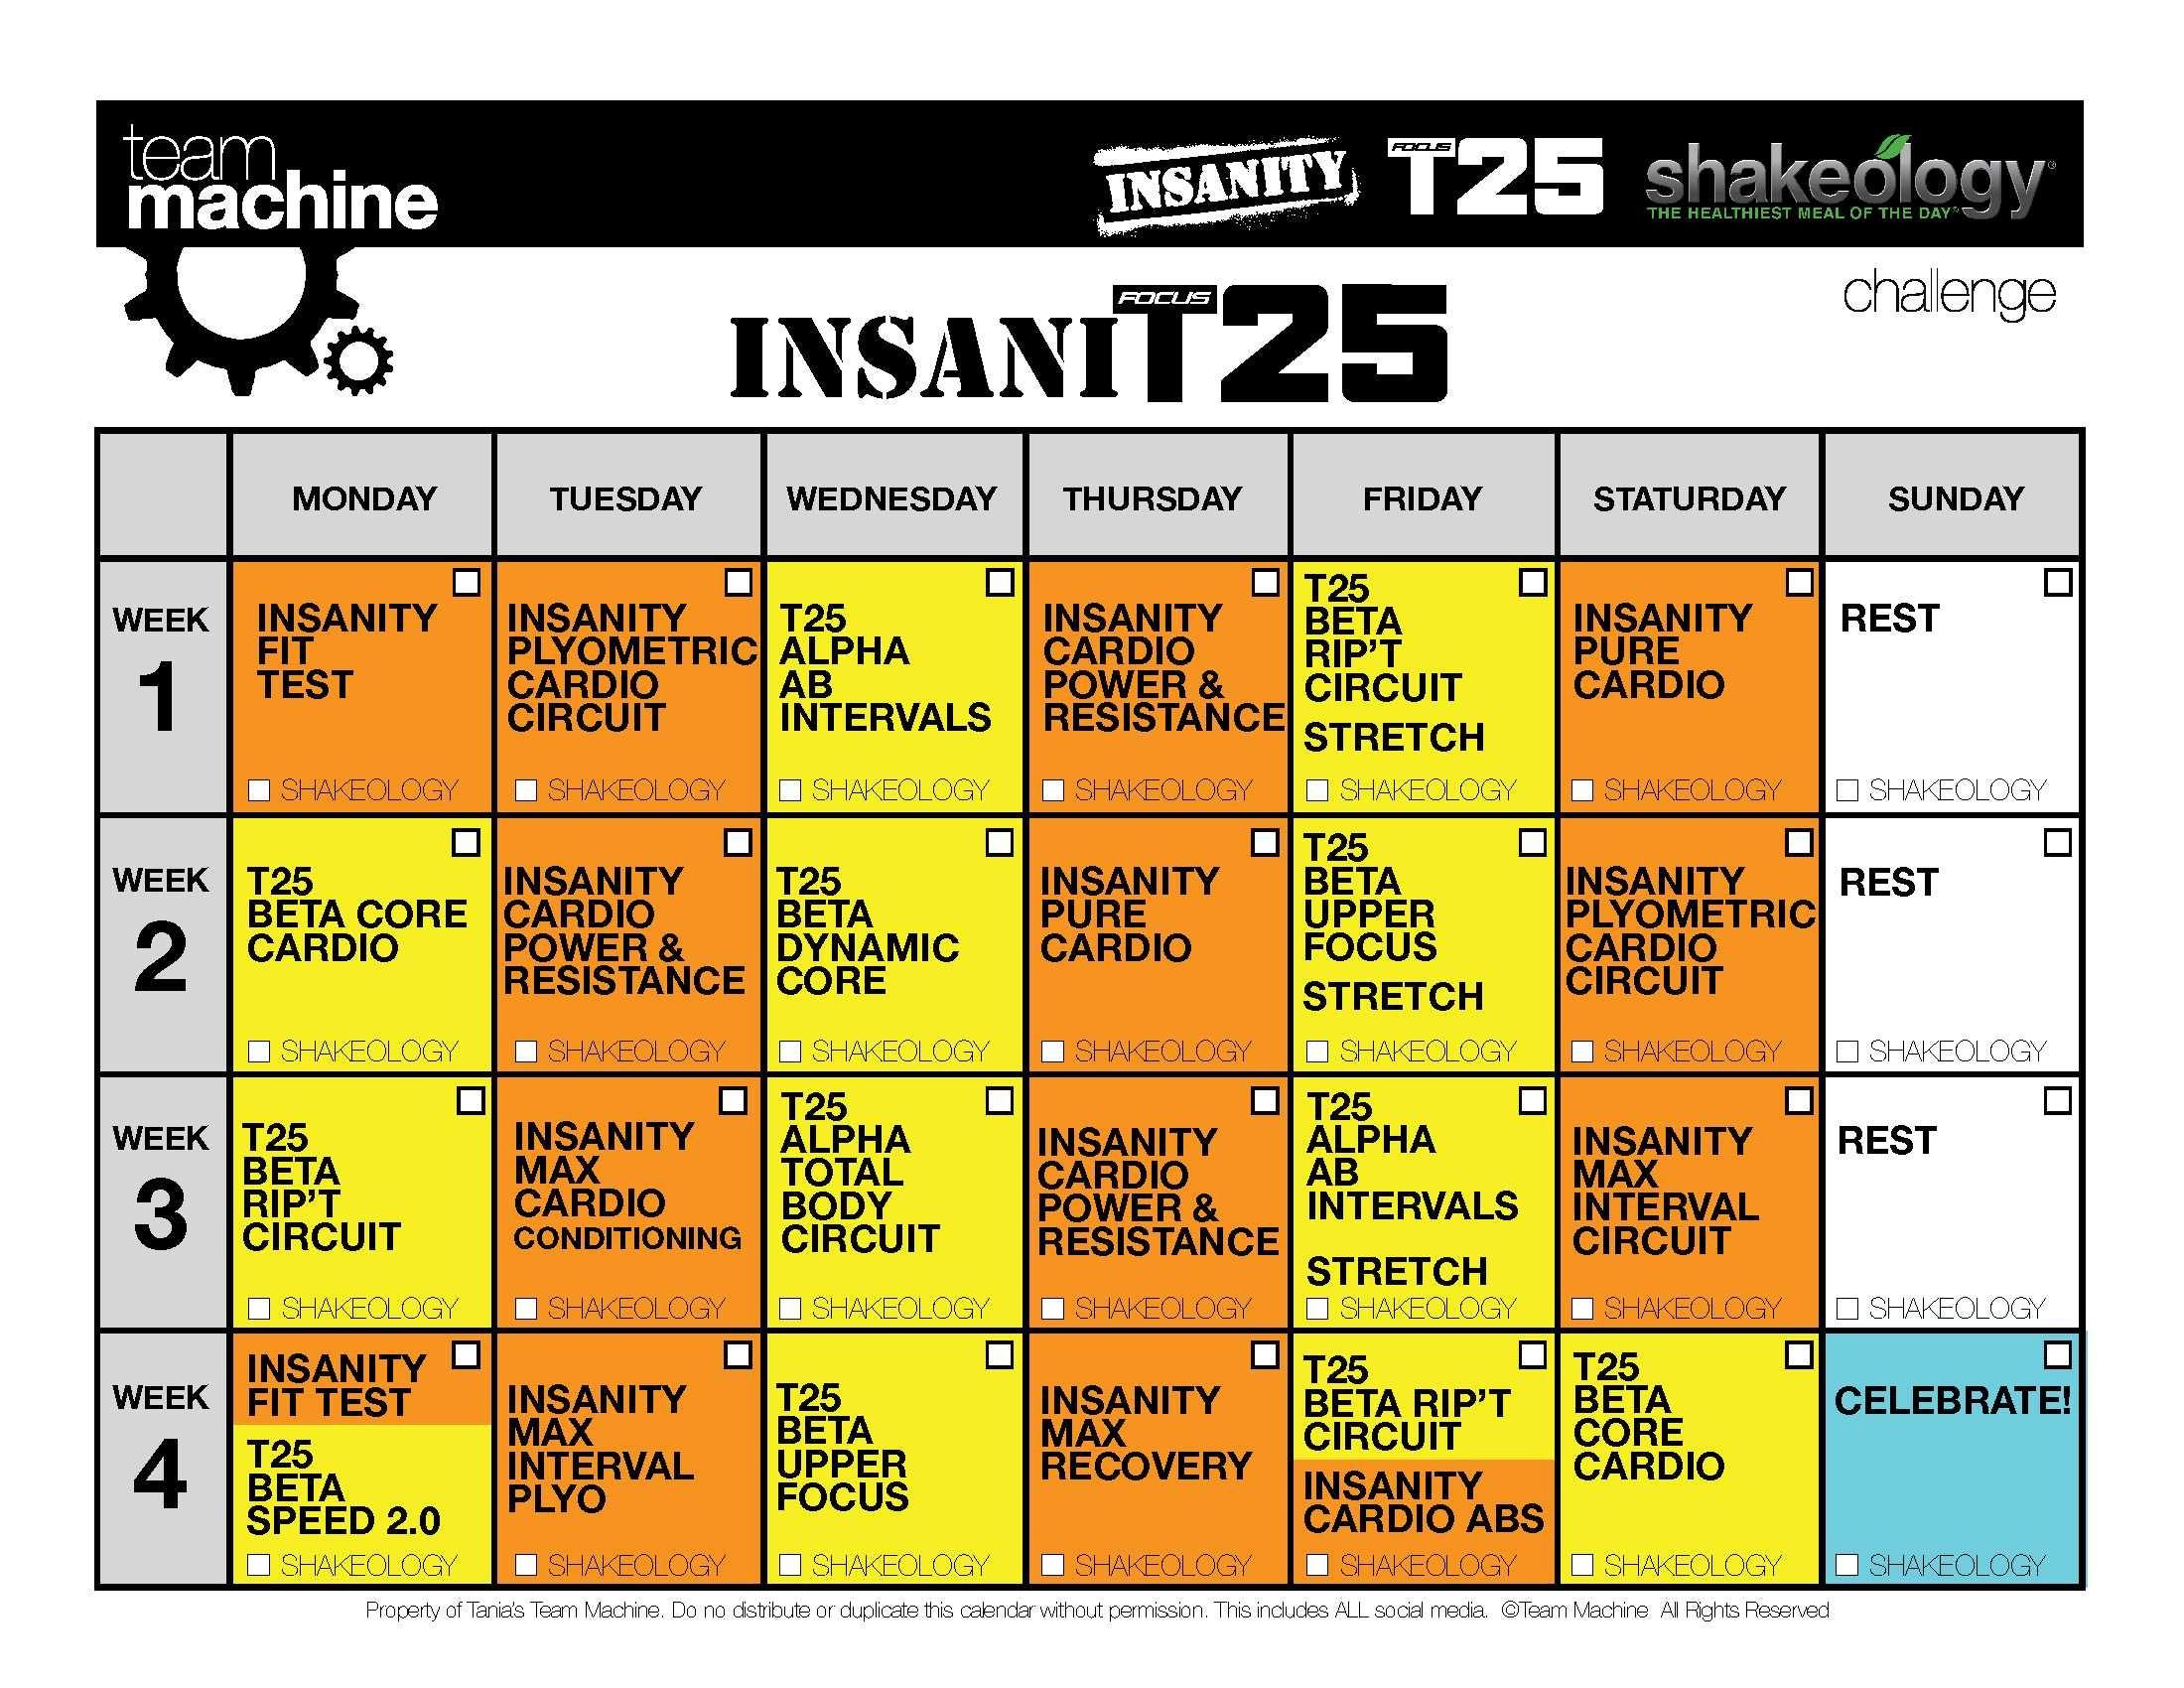 Insanity Amp T25 Hybrid Insanit25 Workout Review Amp Calendar